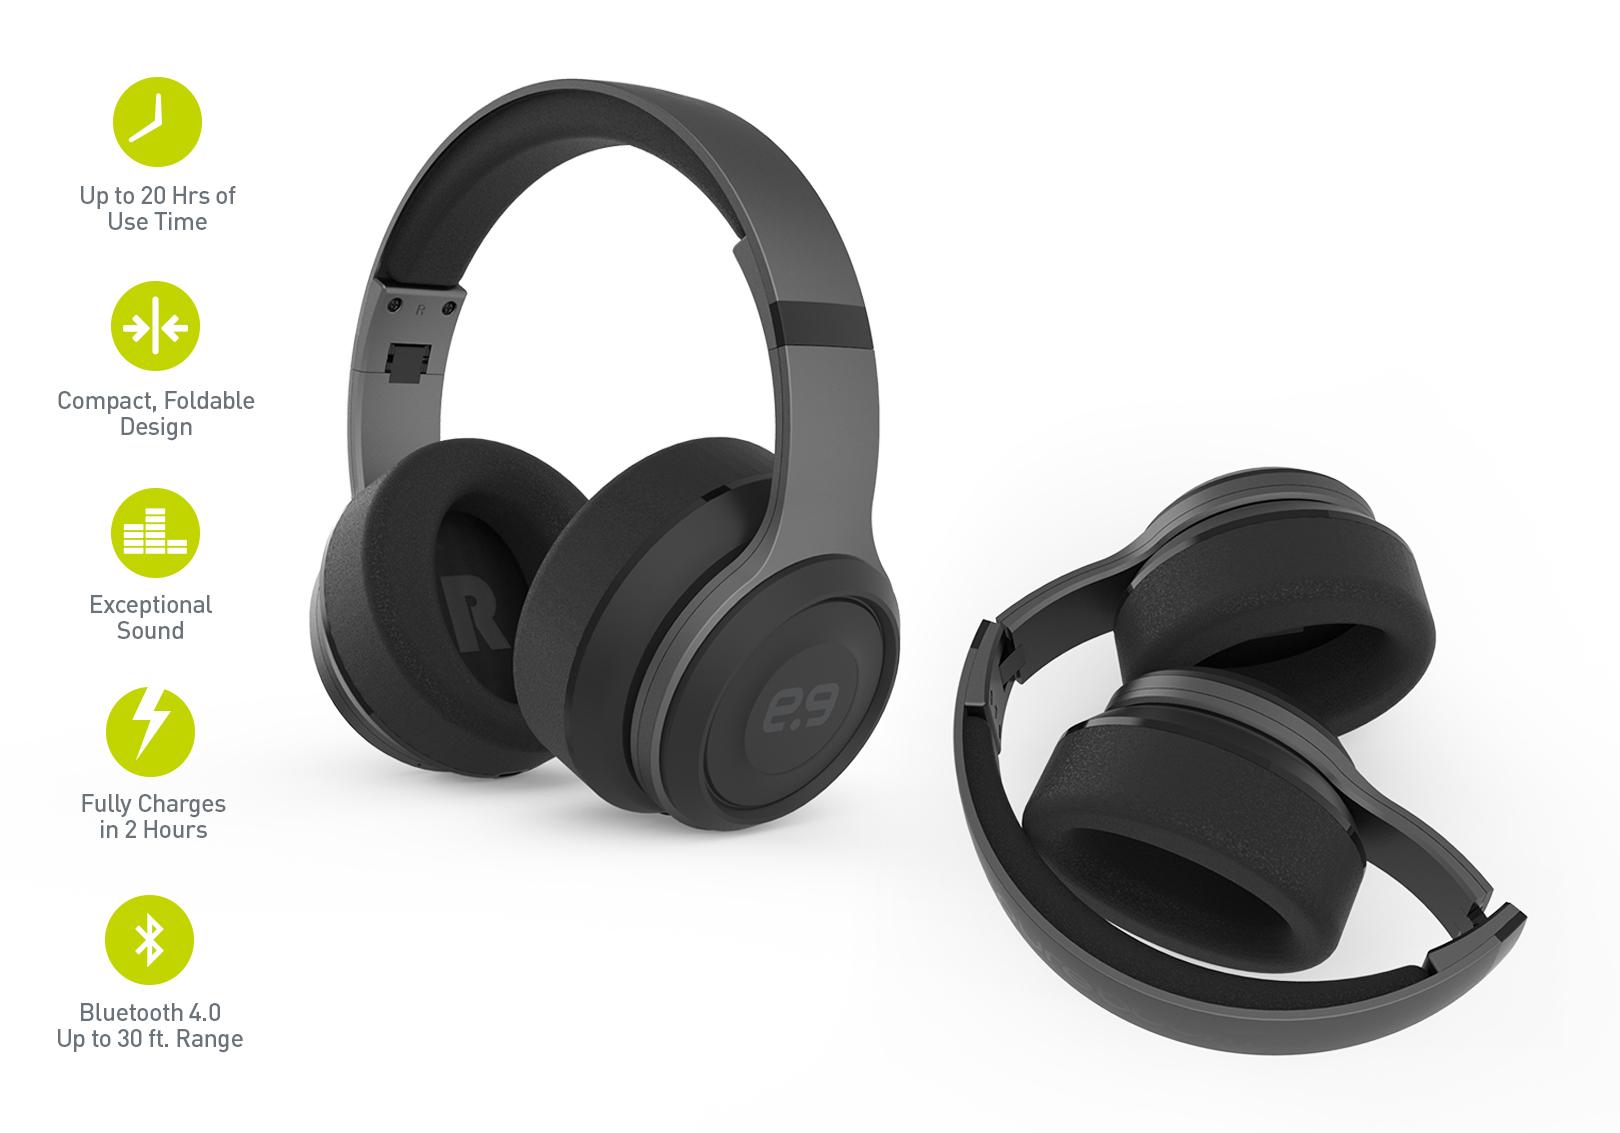 62403PG PureBoom Headphone